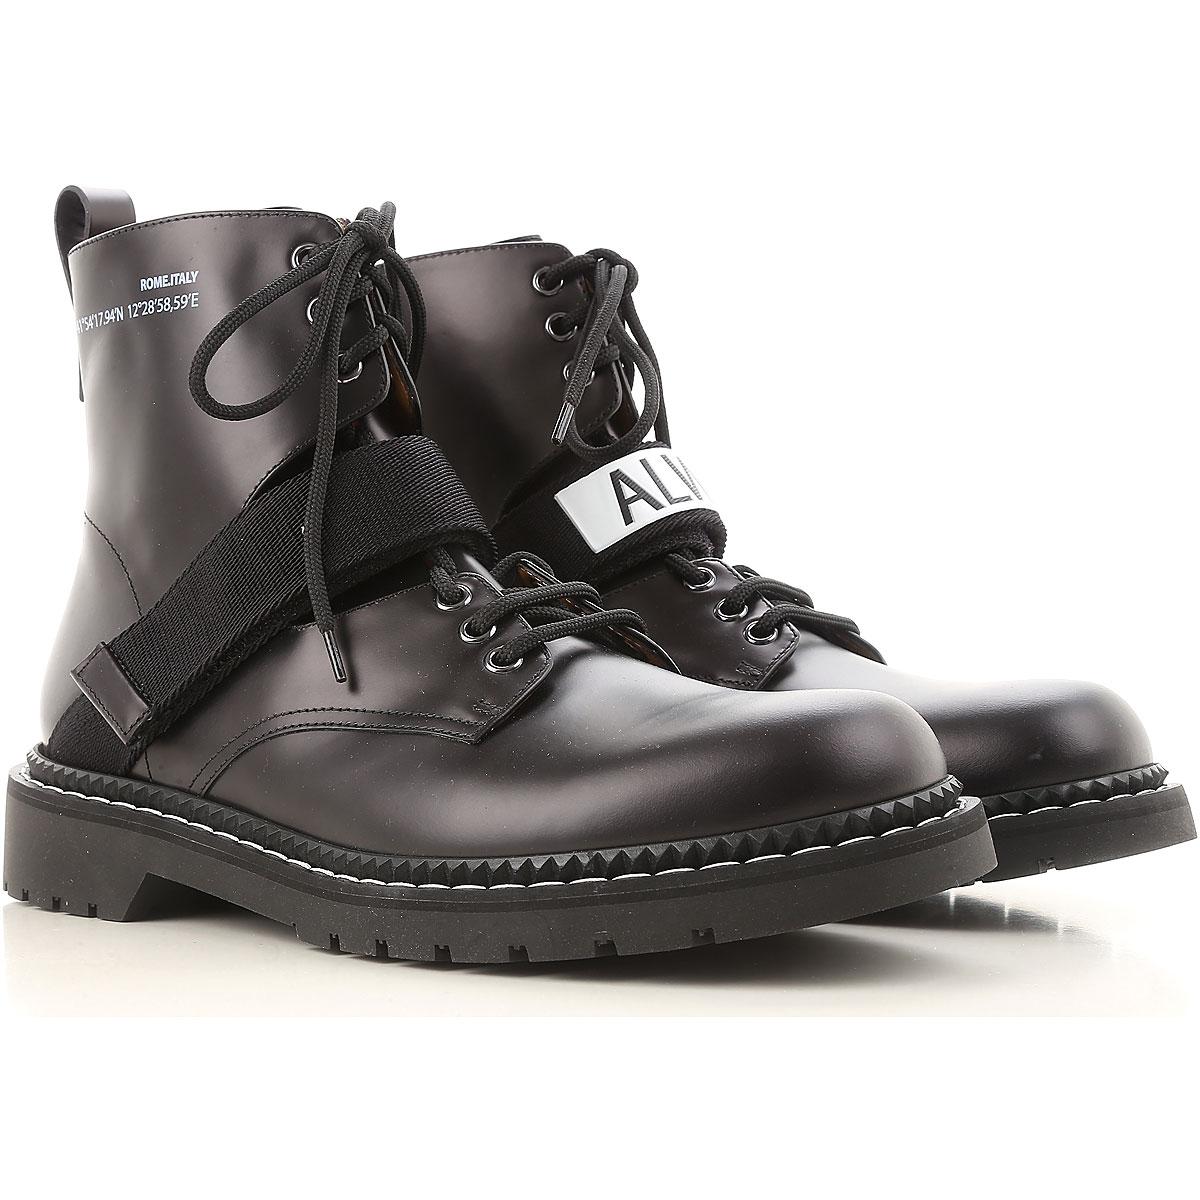 Mens Shoes Valentino Garavani. Style code: py2s0a47-esz-0ni